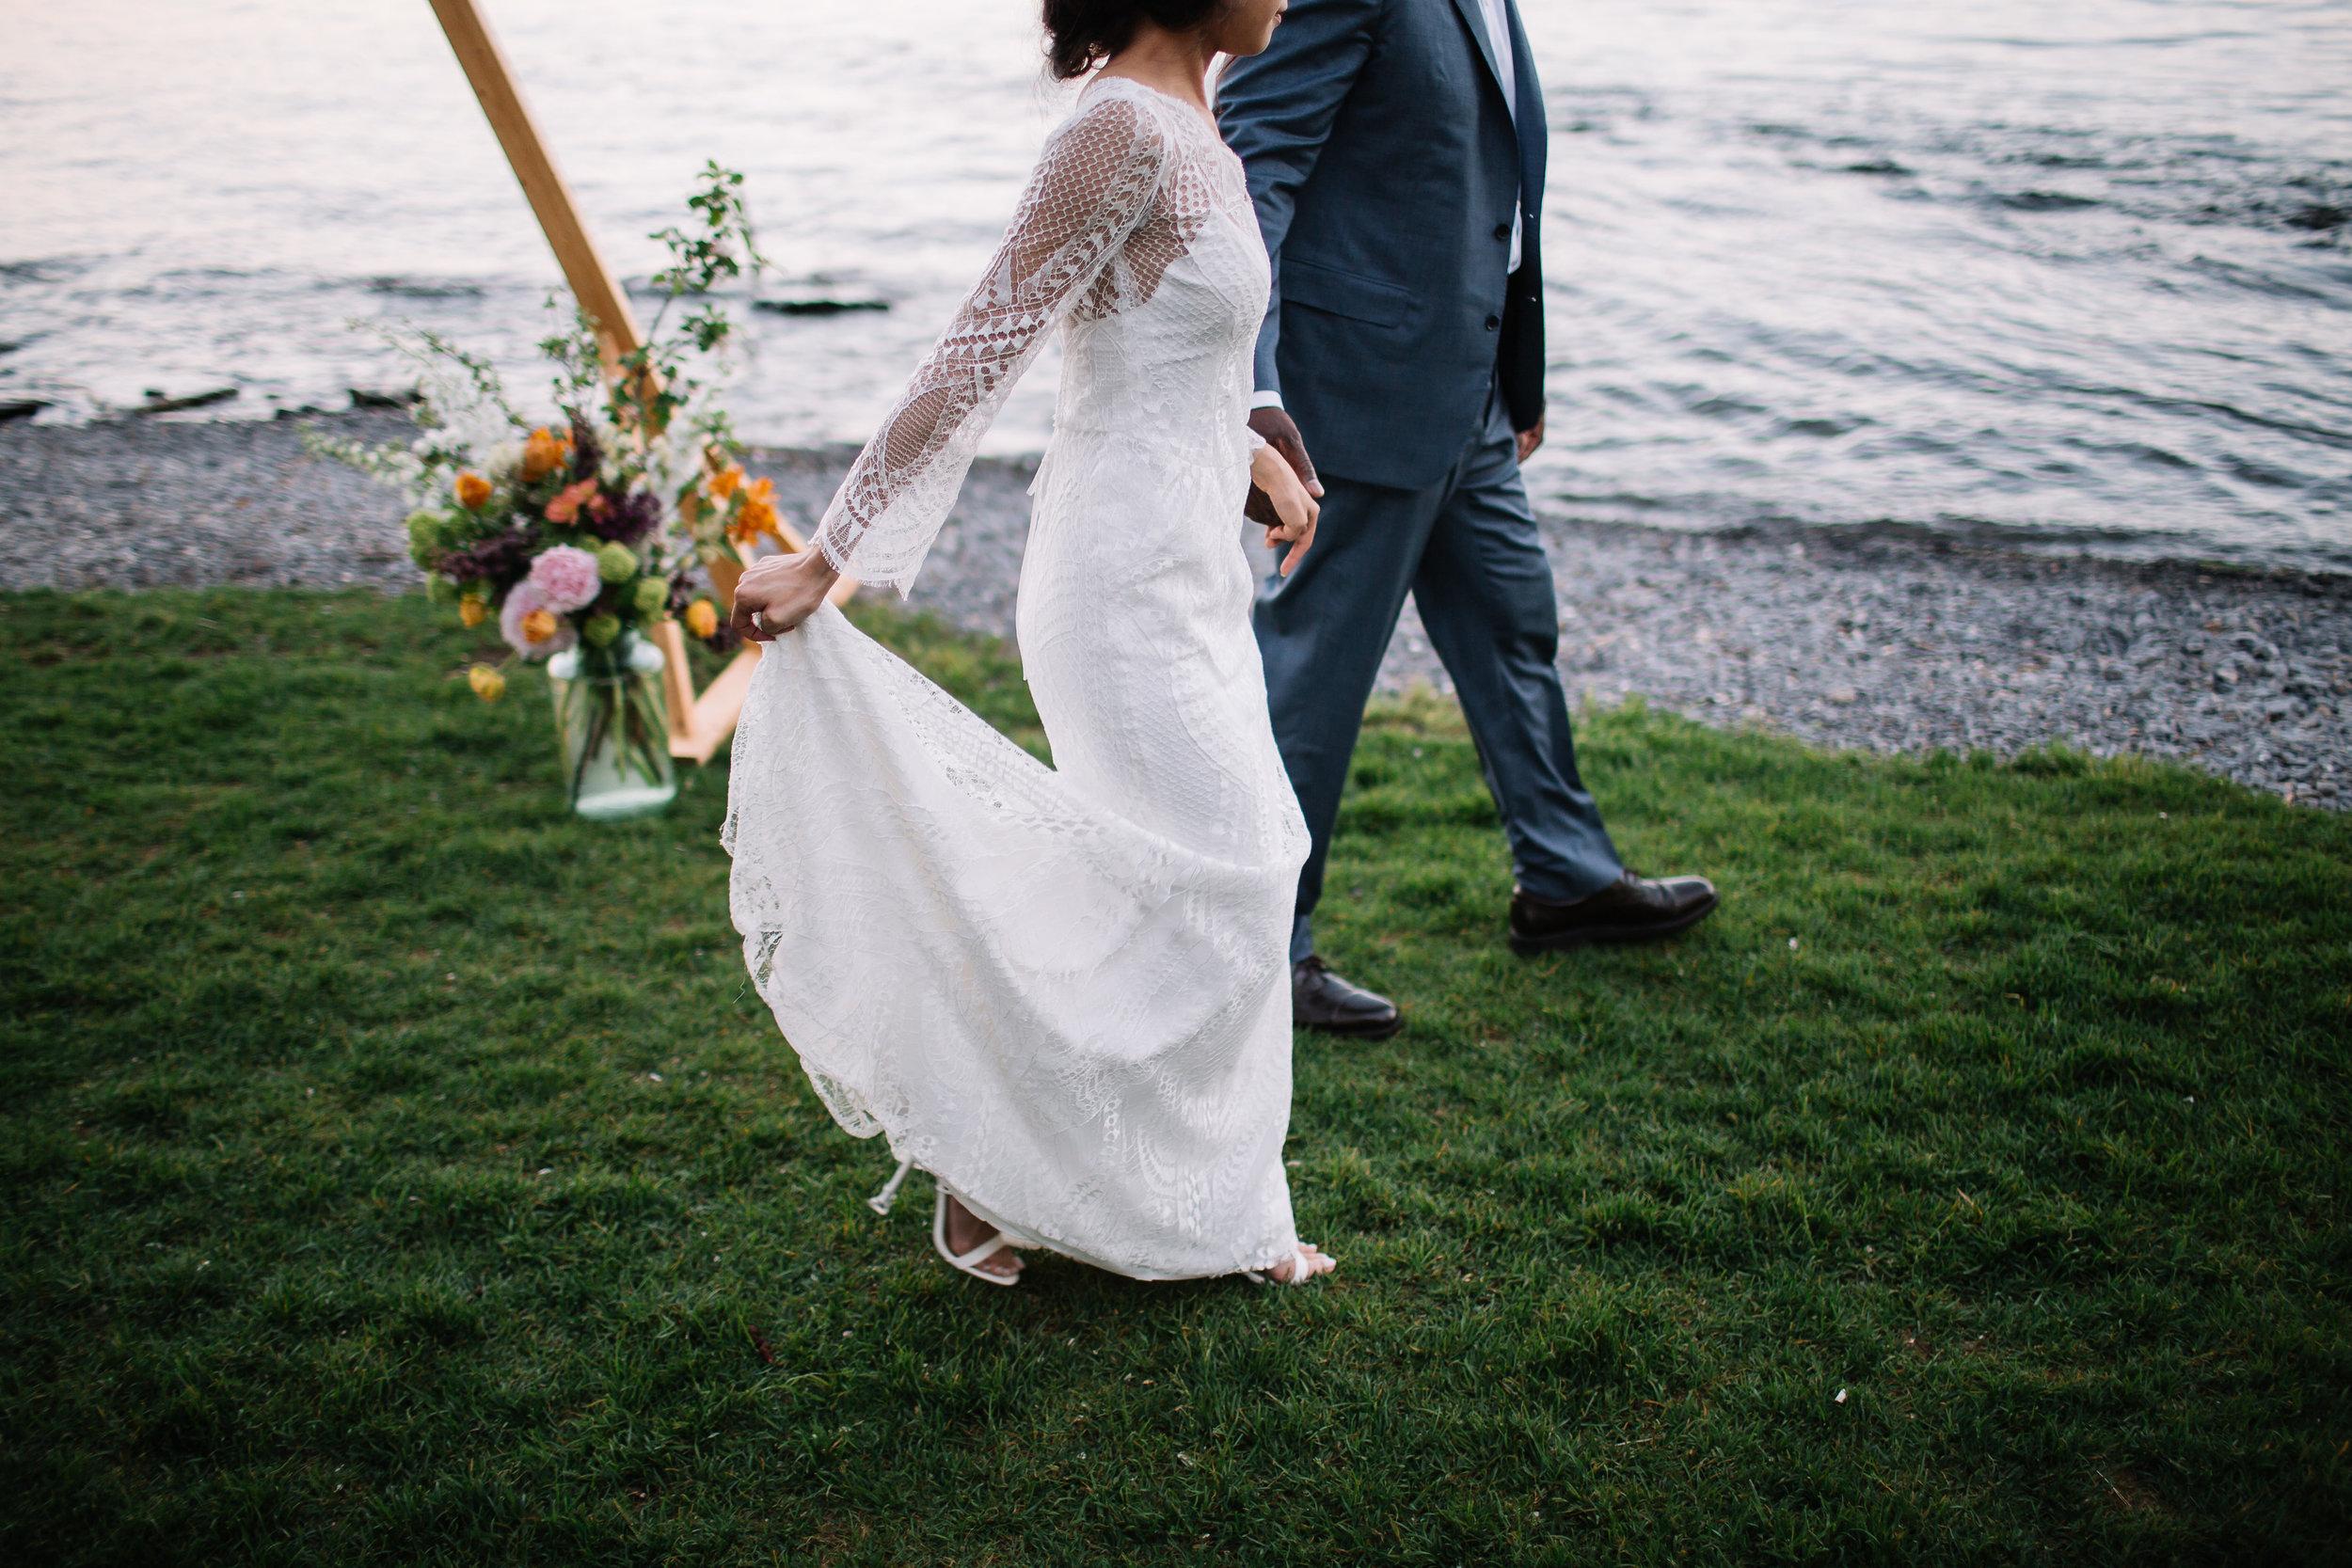 6daee1d378f6-drake_devonshire_wedding_898.jpg